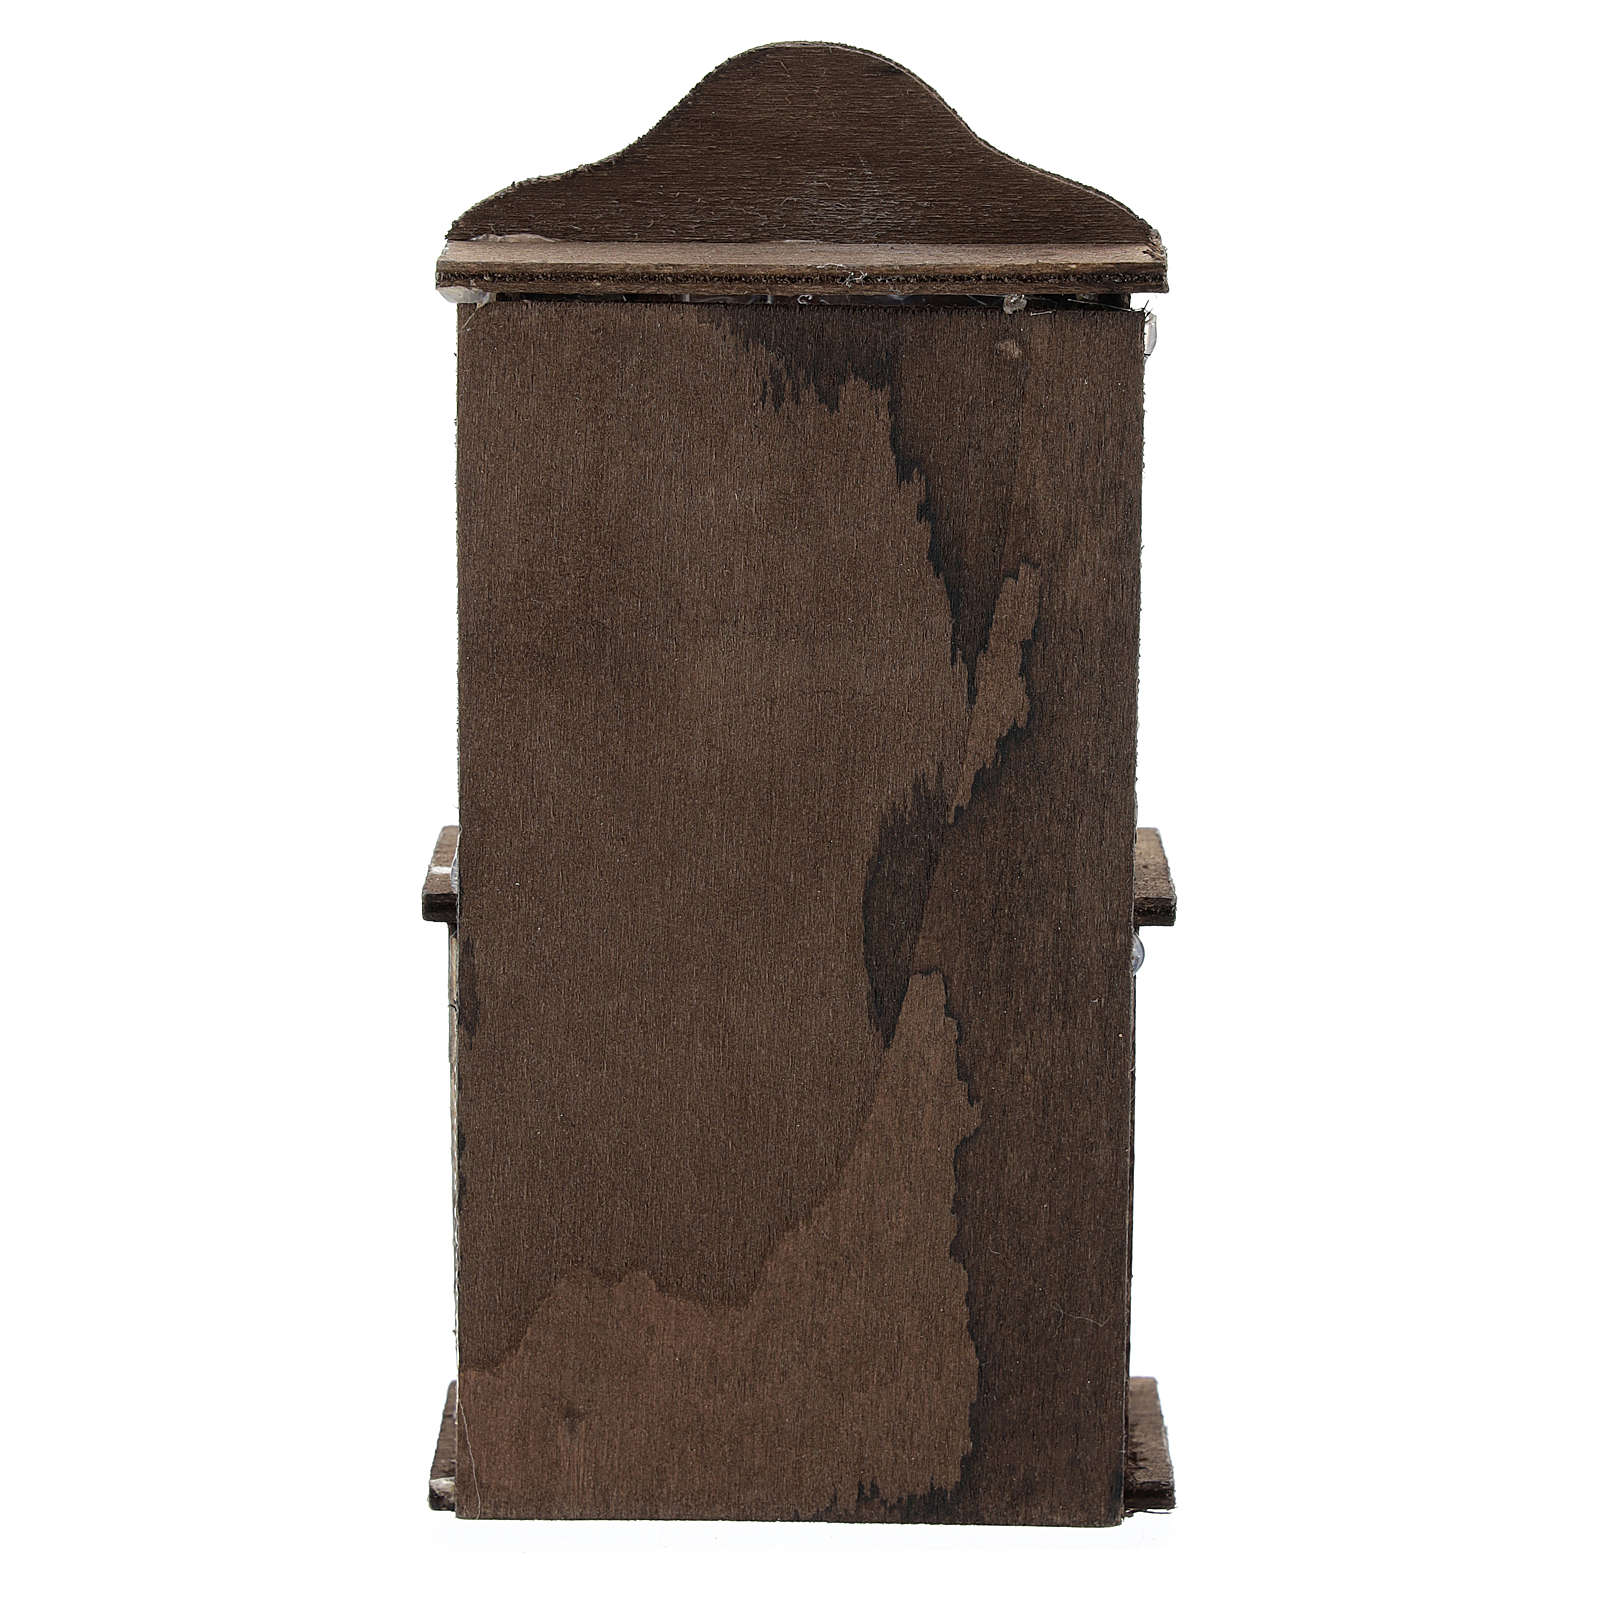 Buffet avec tiroirs bois crèche 11 cm 4